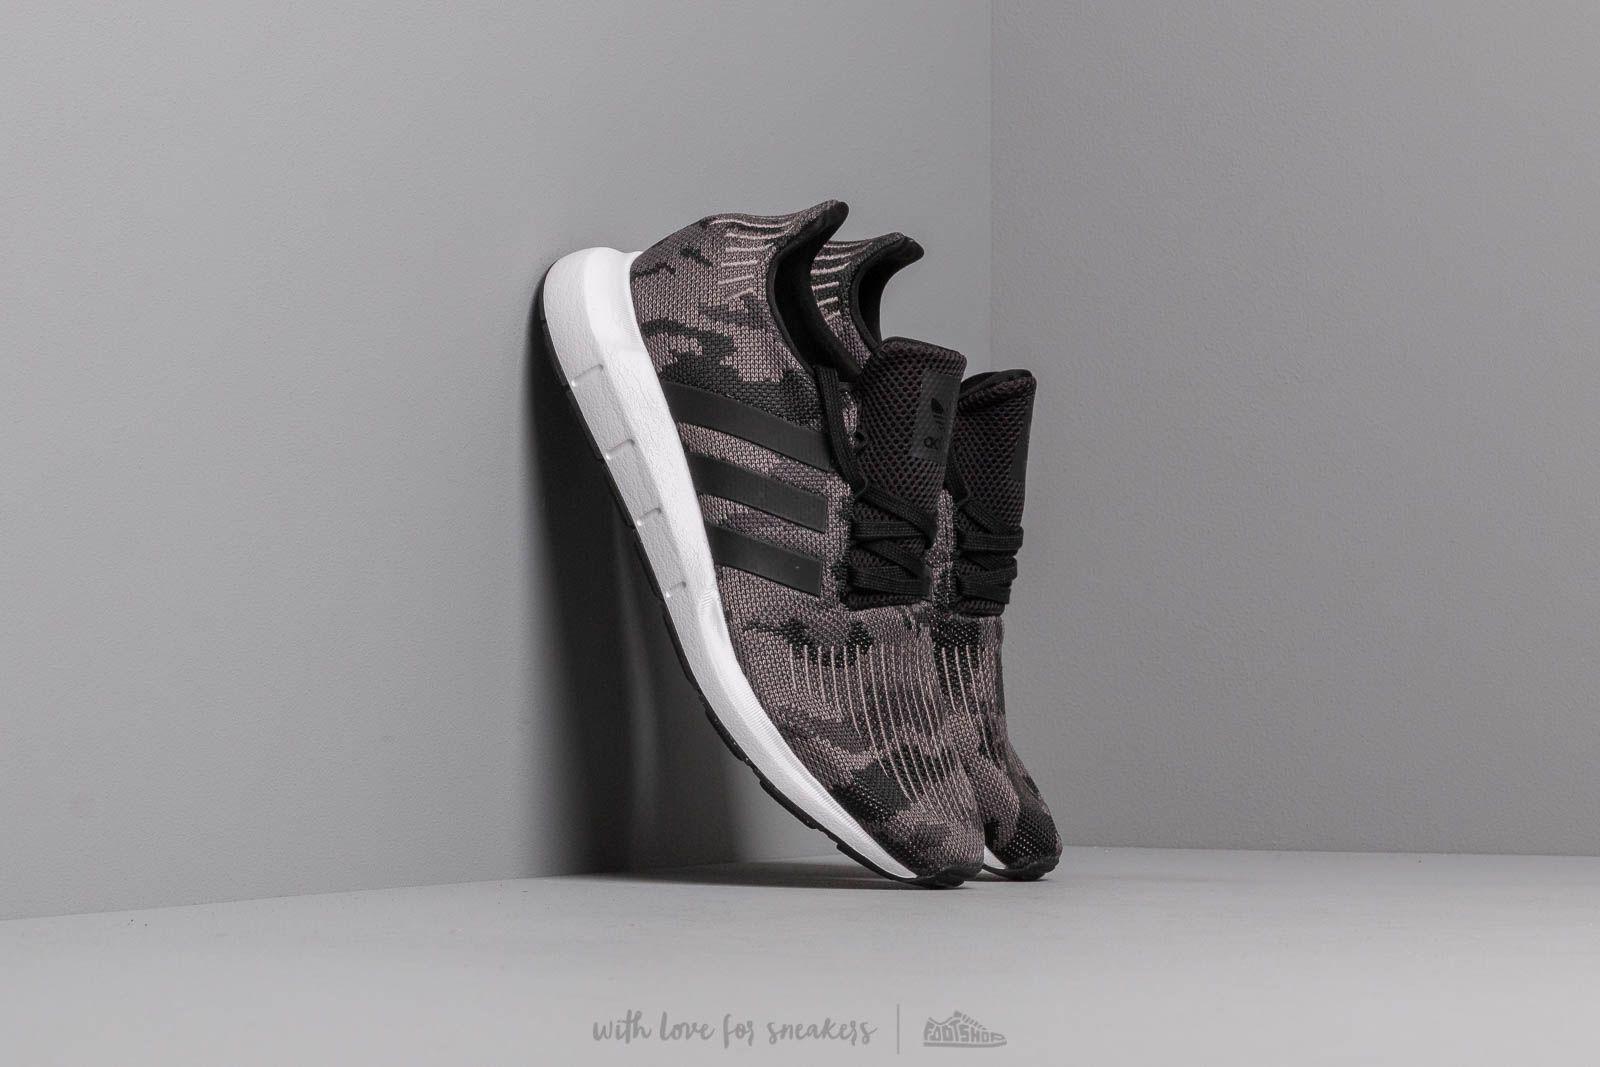 adidas Swift Run Core Black/ Core Black/ Ftw White at a great price 2 738 ГРН купите на Footshop.ua